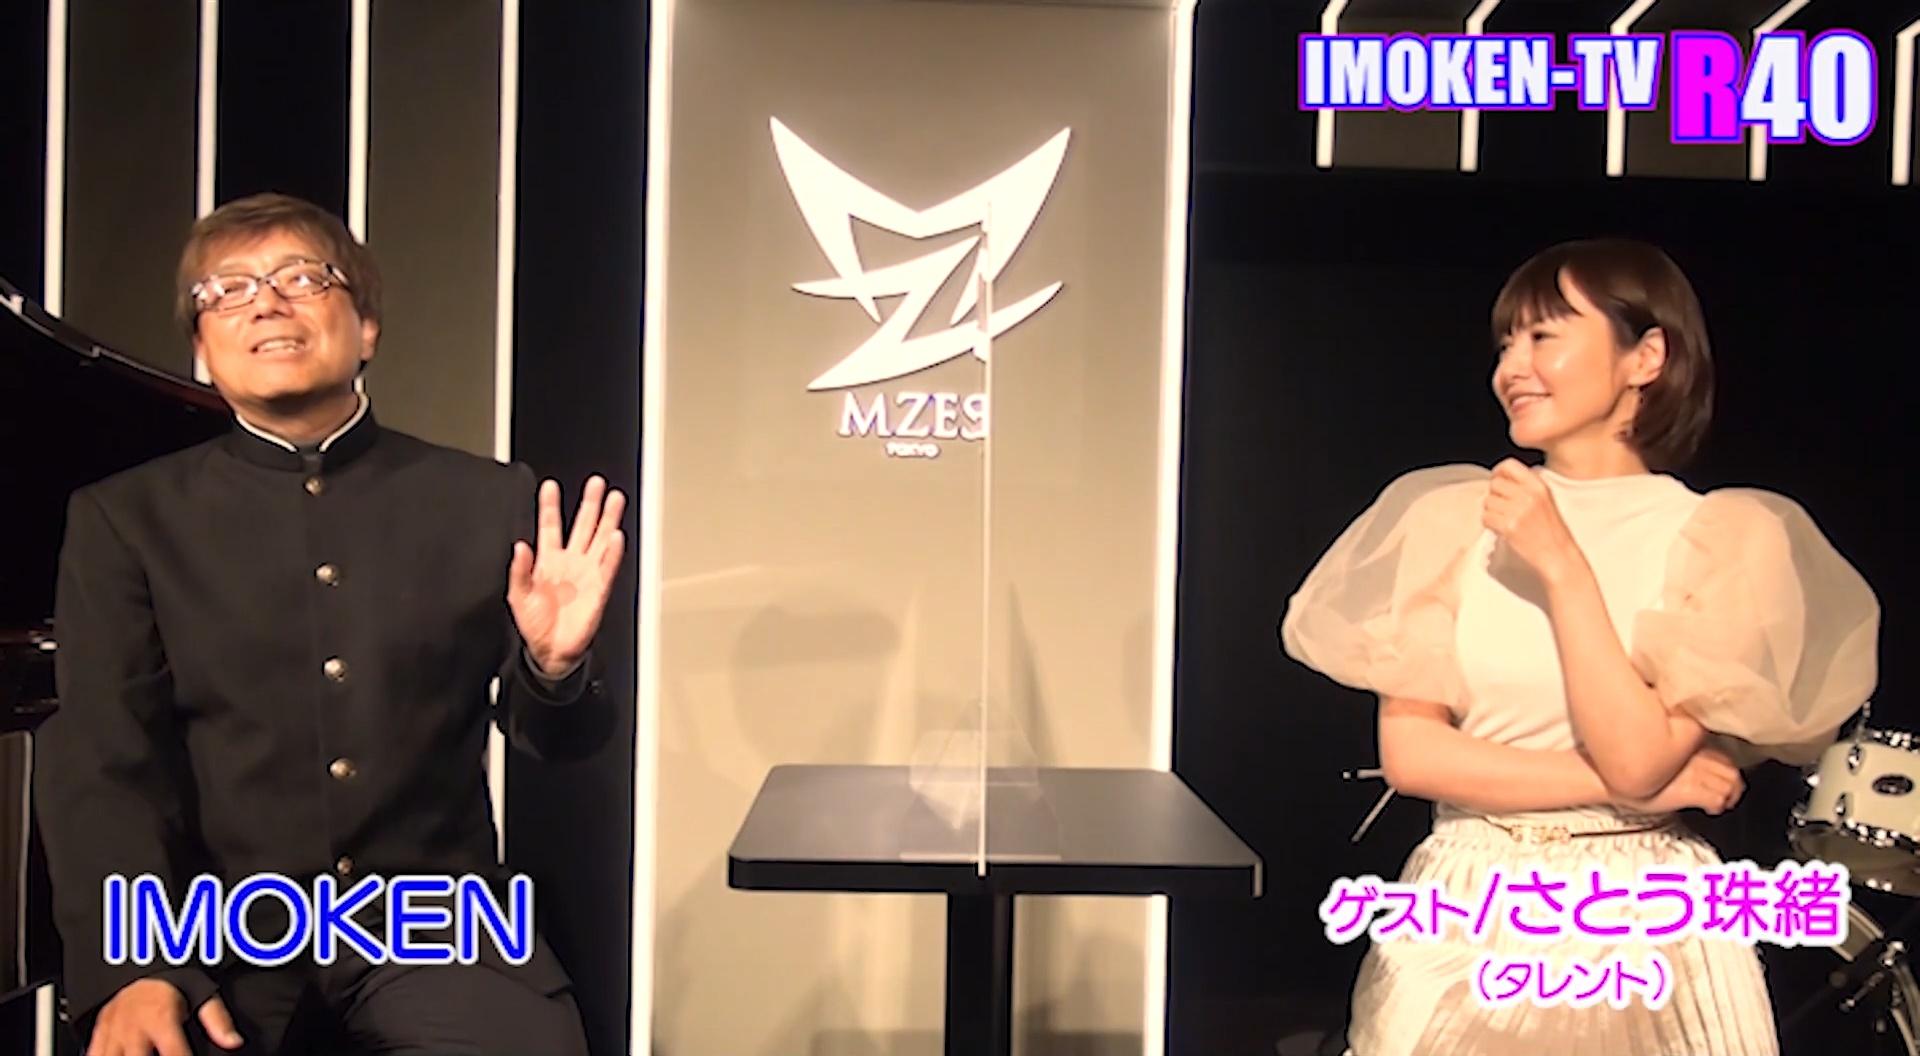 IMOKEN TV さとう珠緒編 (後編)